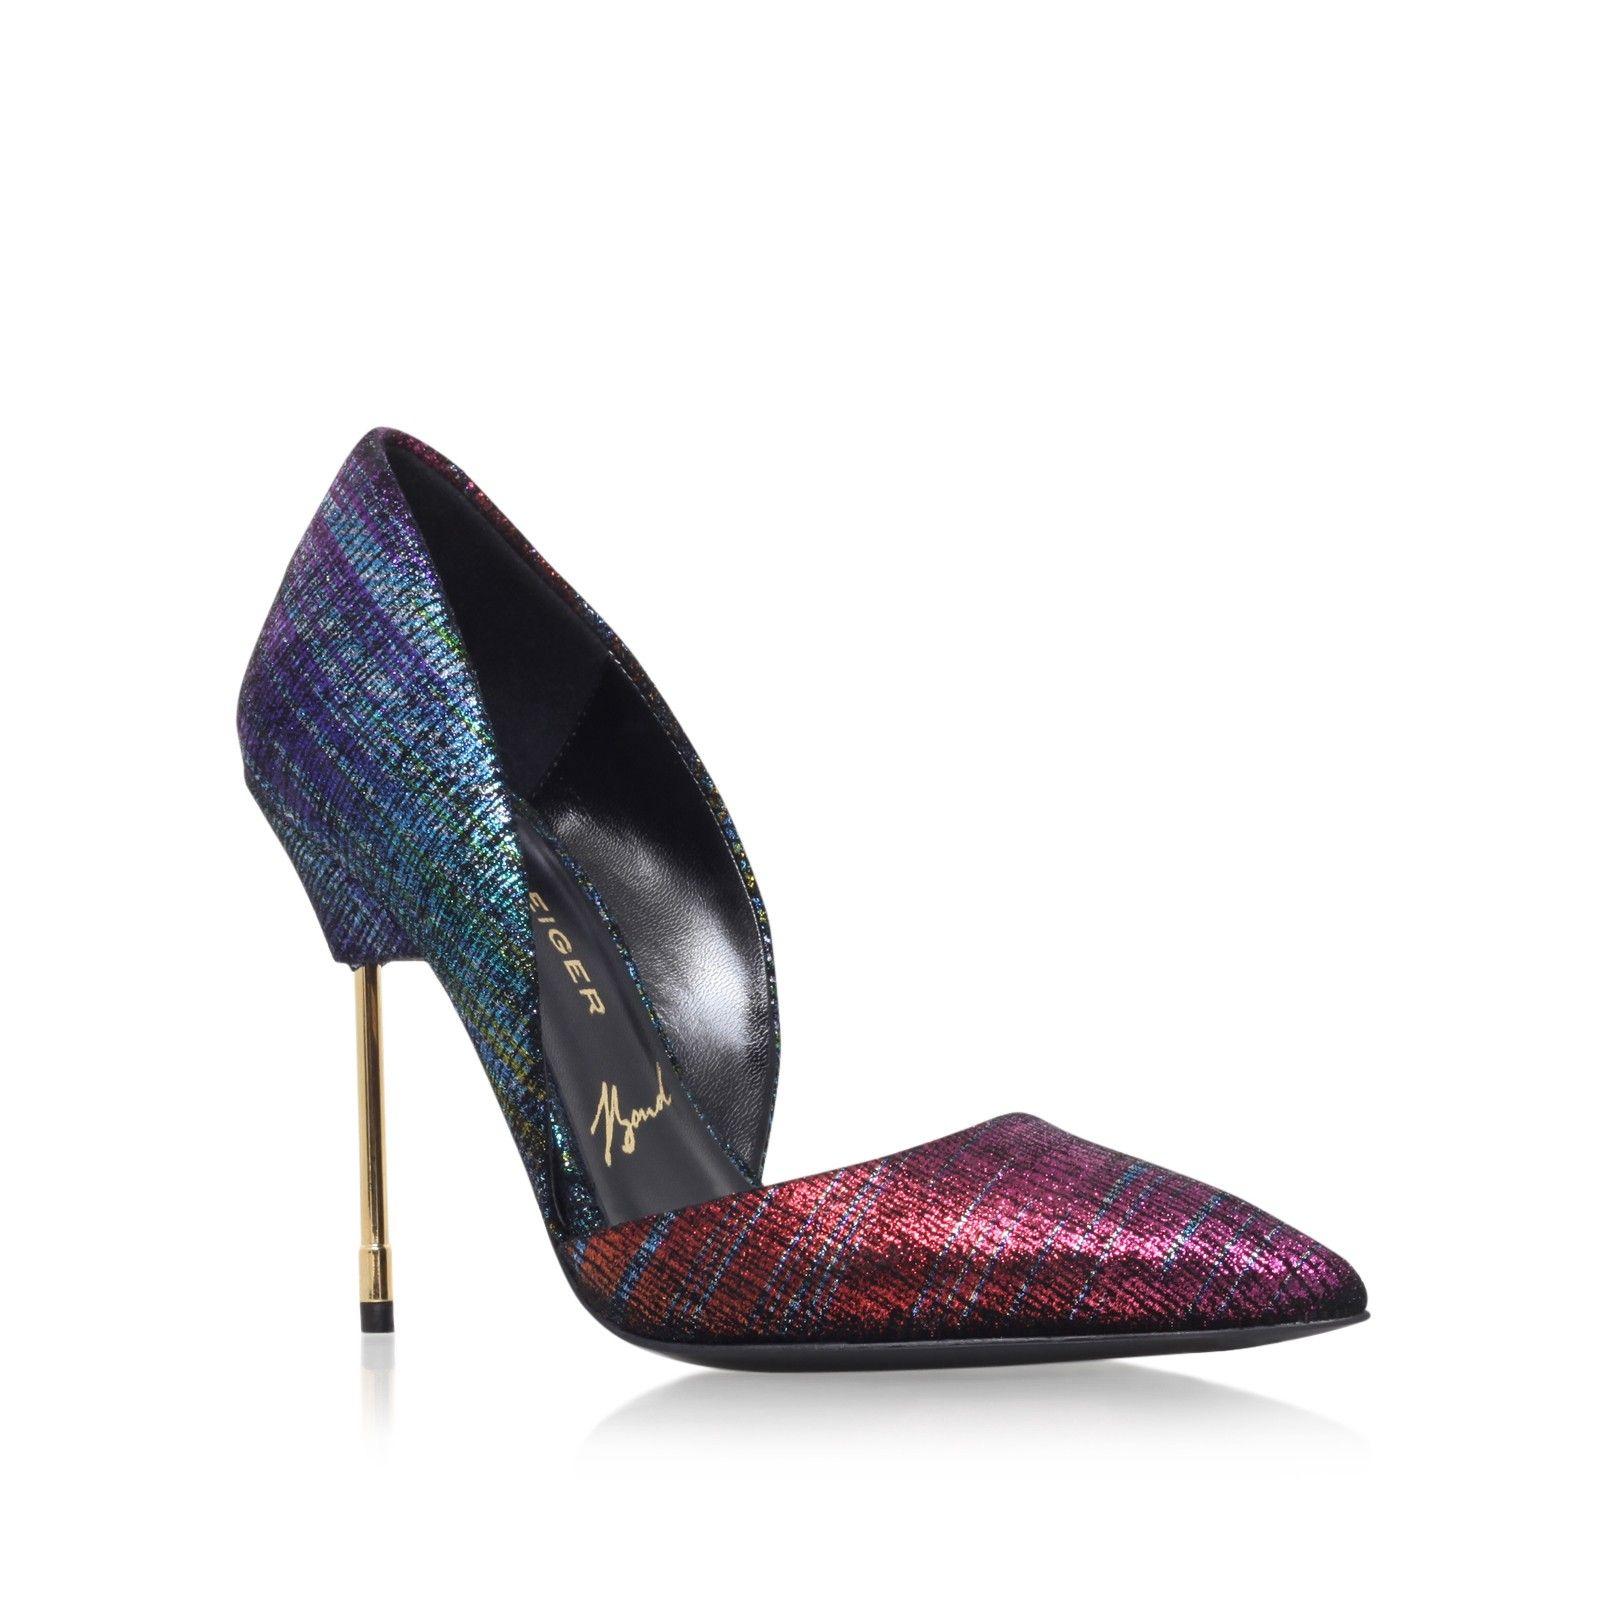 Multi coloured high heels